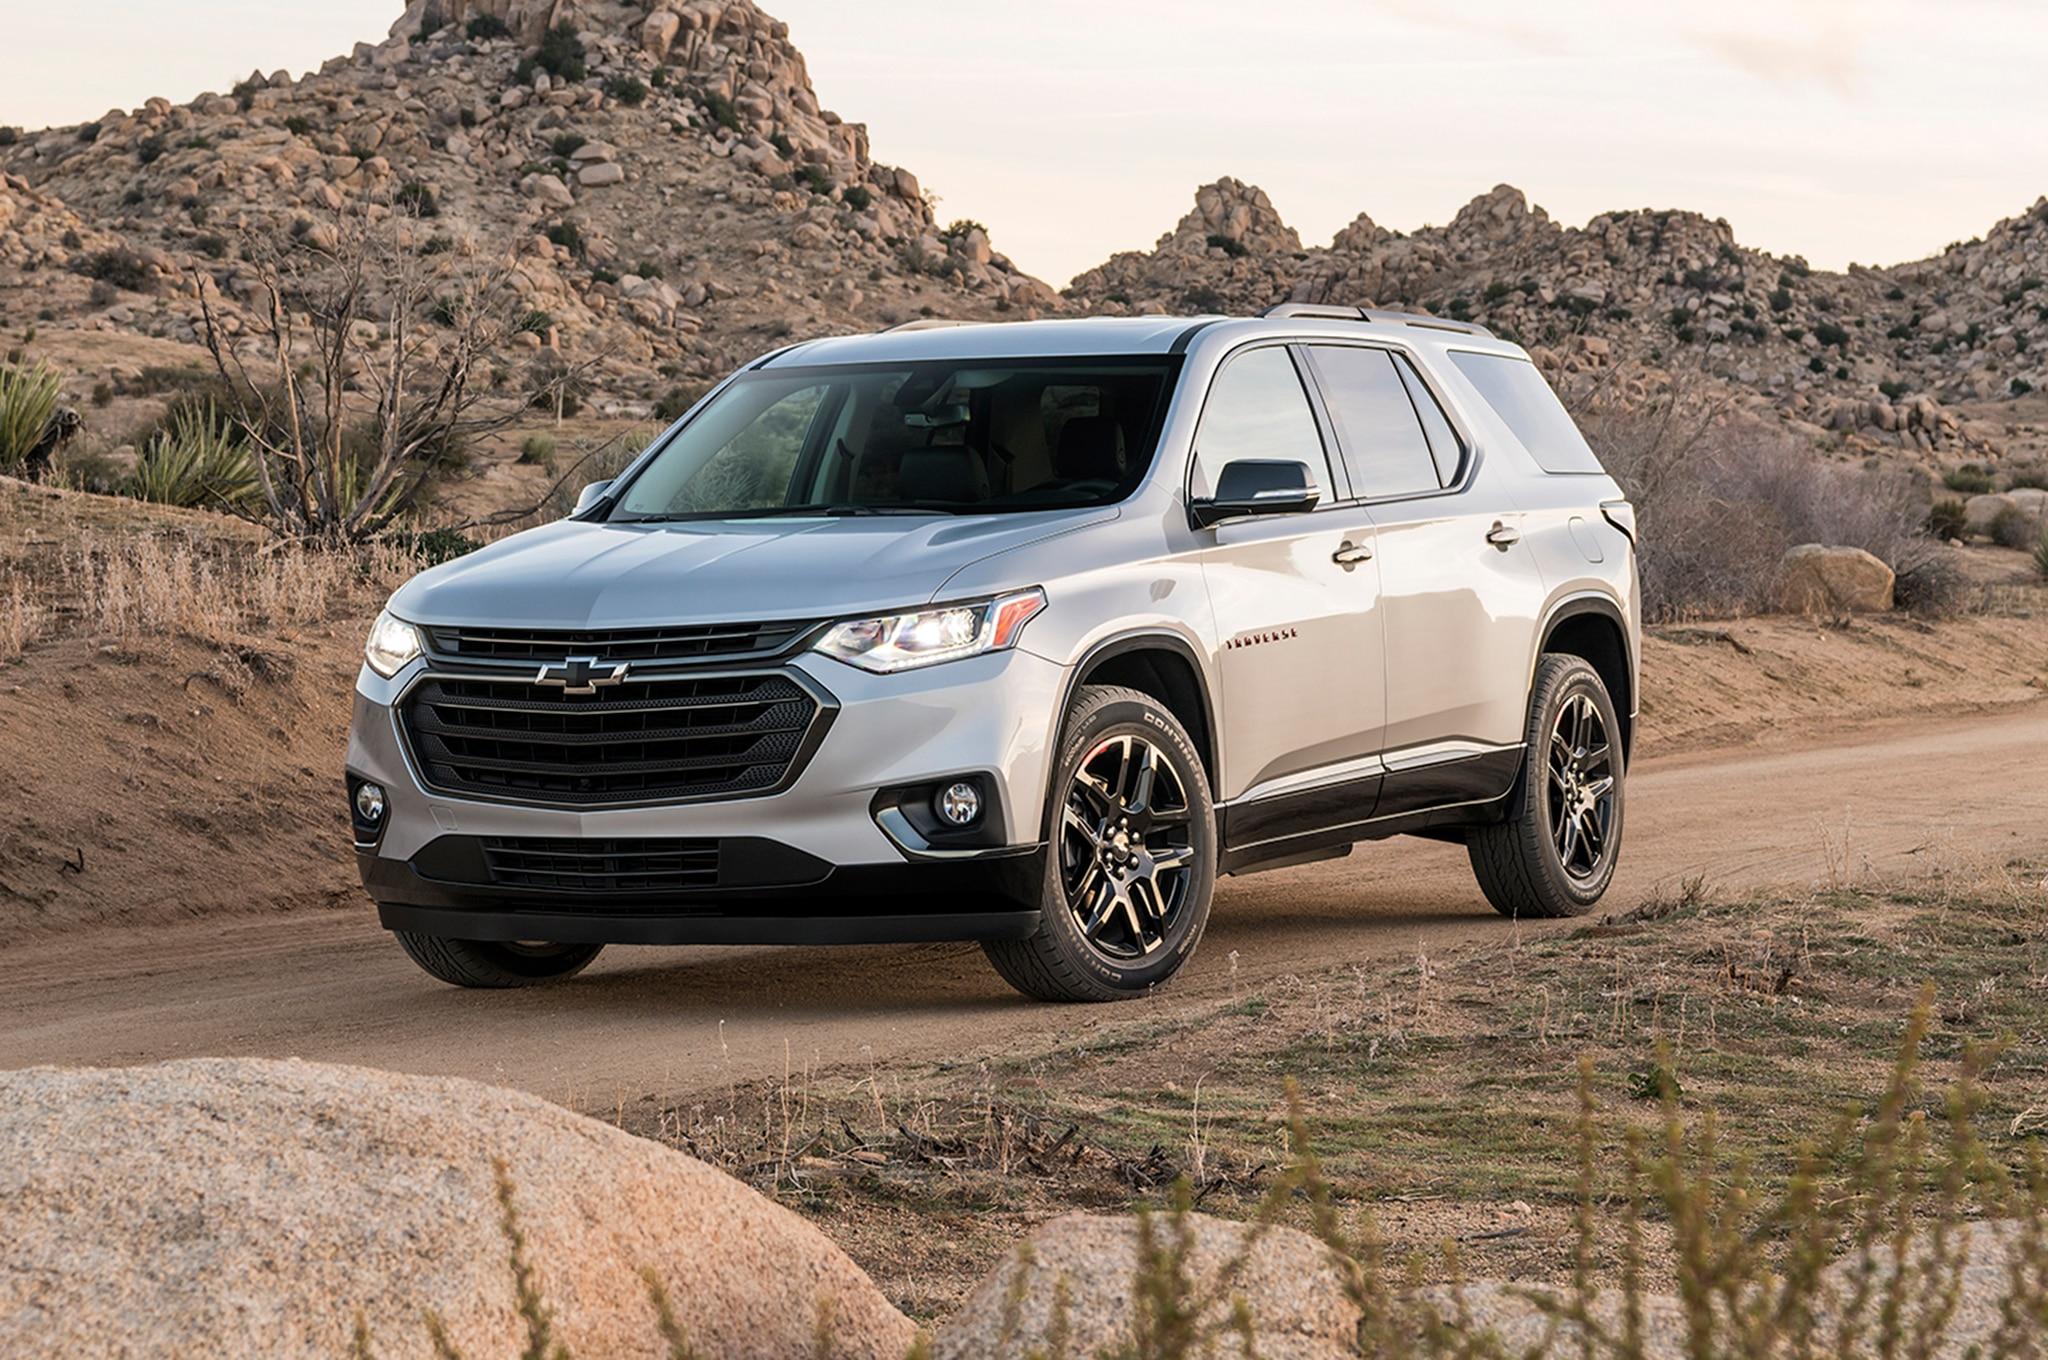 2018 Chevrolet Traverse FWD Premier Quick Take Review